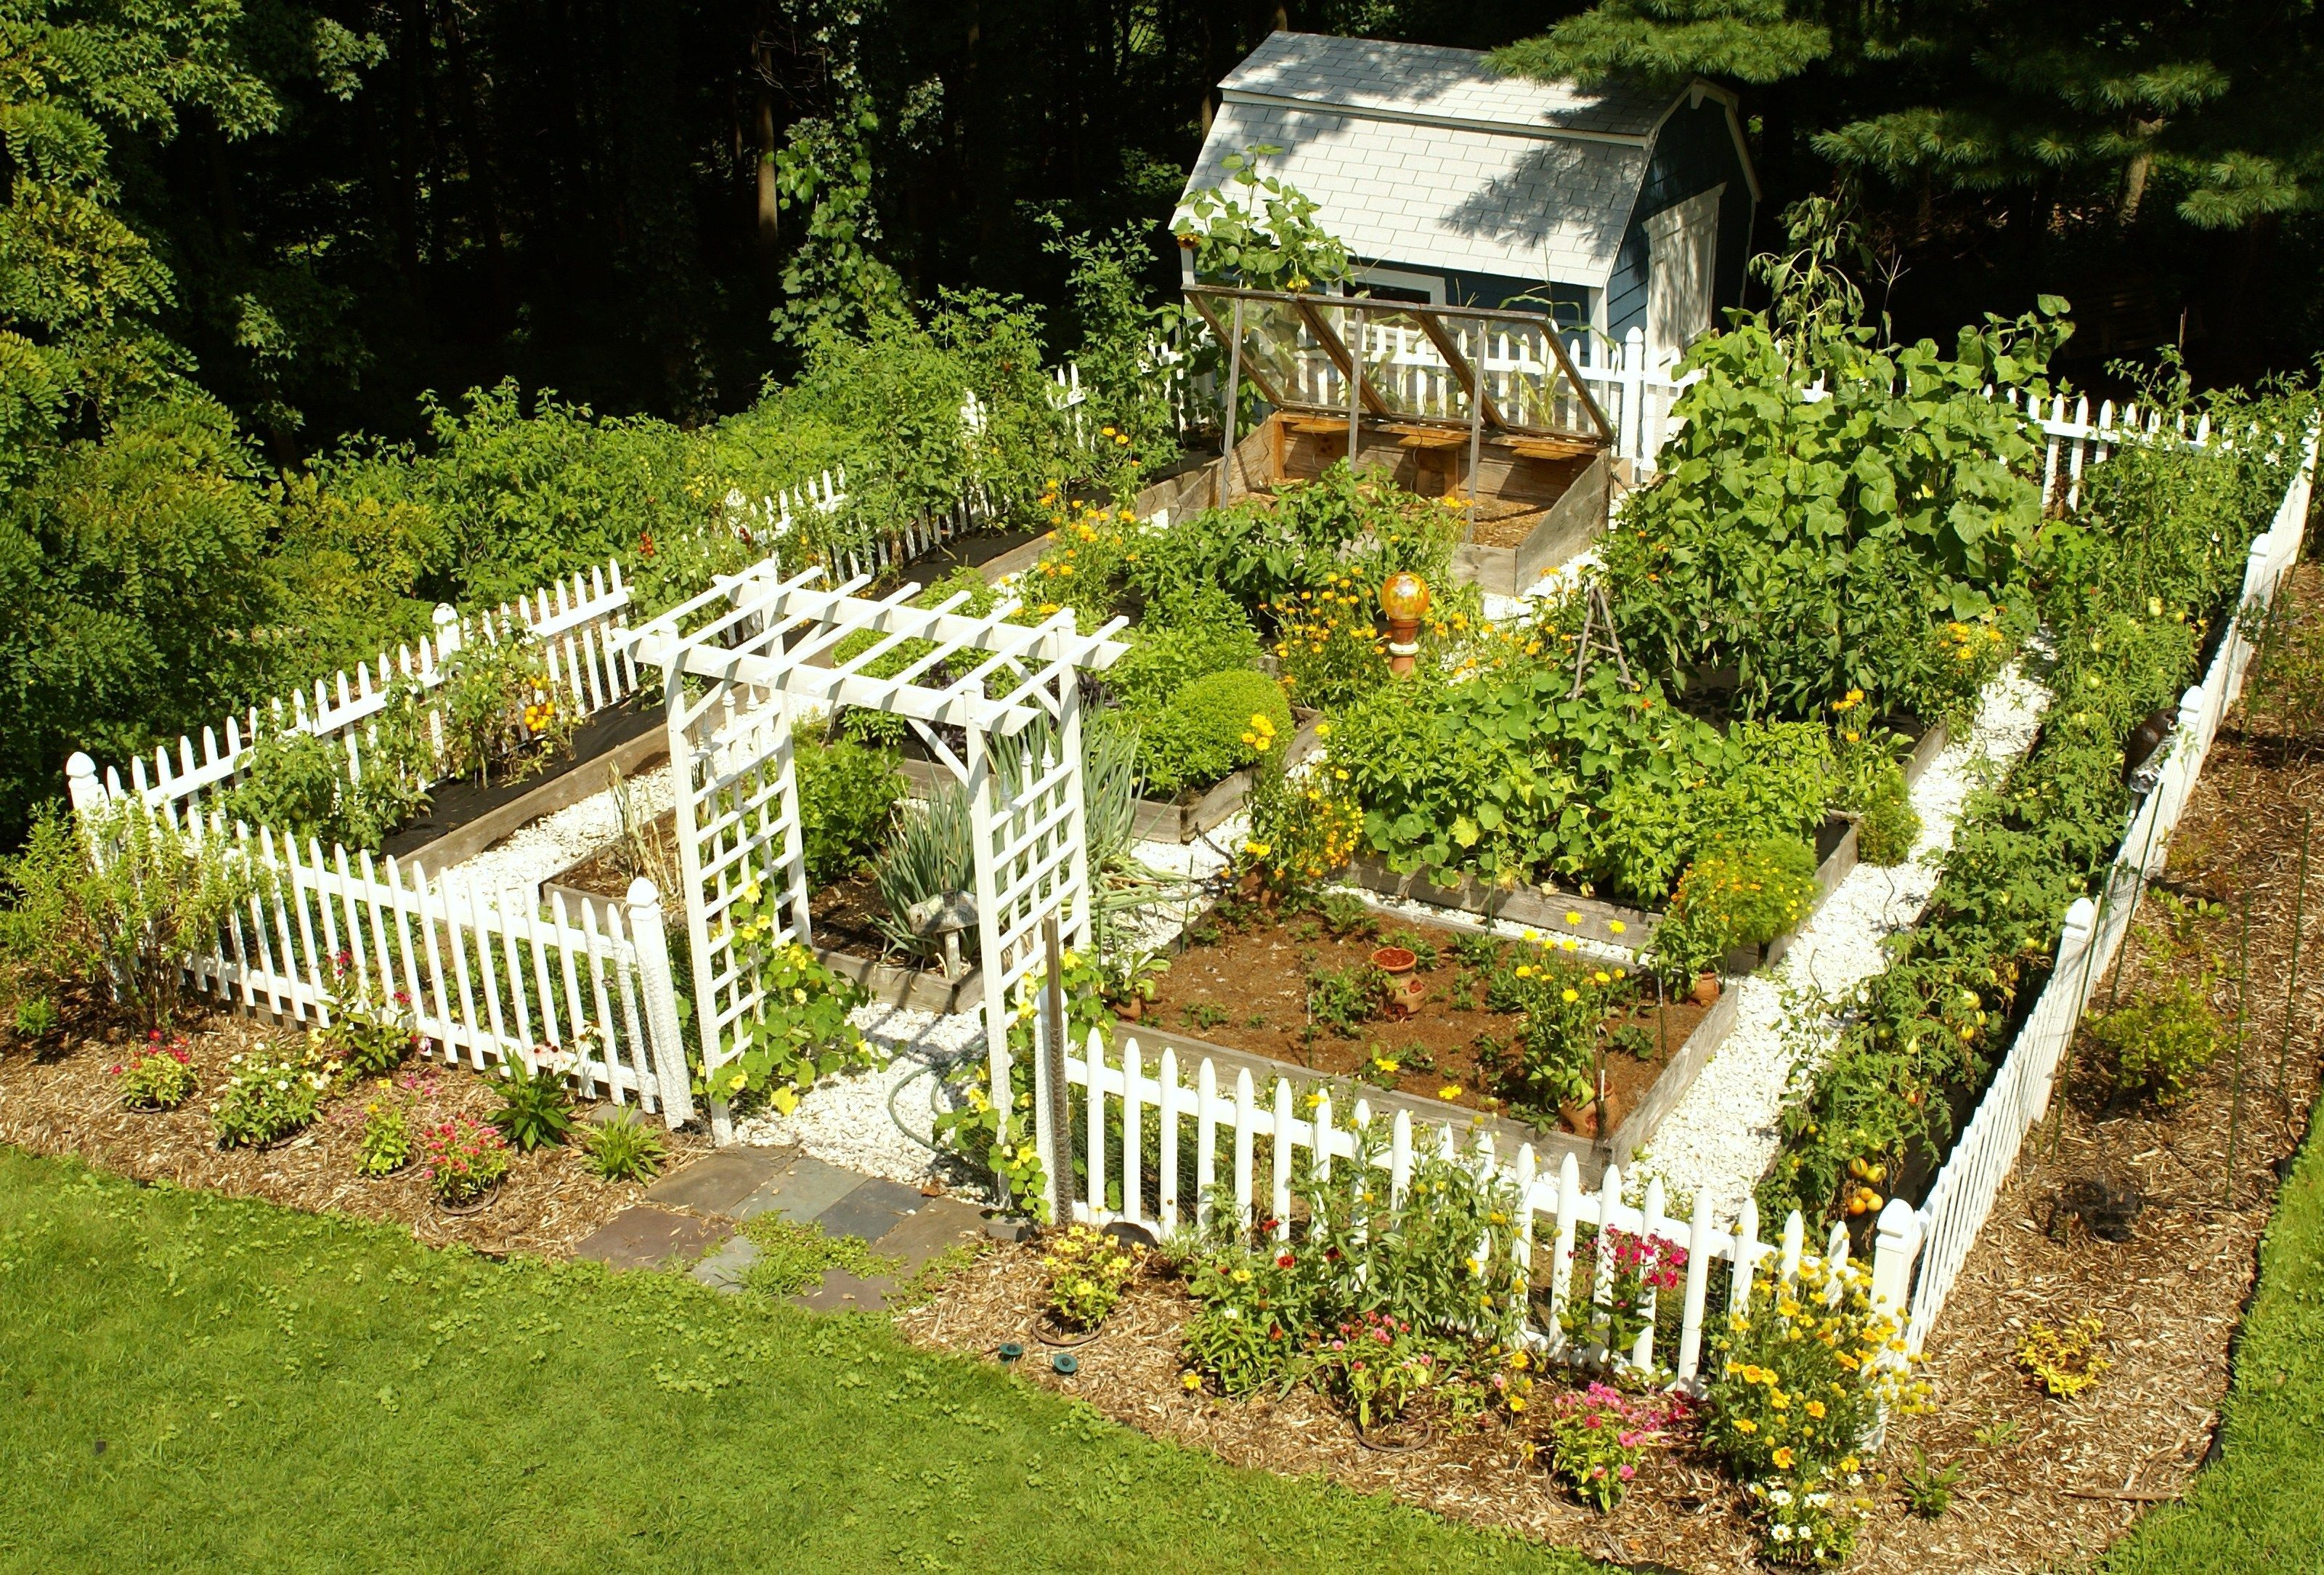 Vegetable Garden Planner Layout Design Plans For Small Home Gardens Vegetable Garden Planner Garden Planner Garden Layout Vegetable